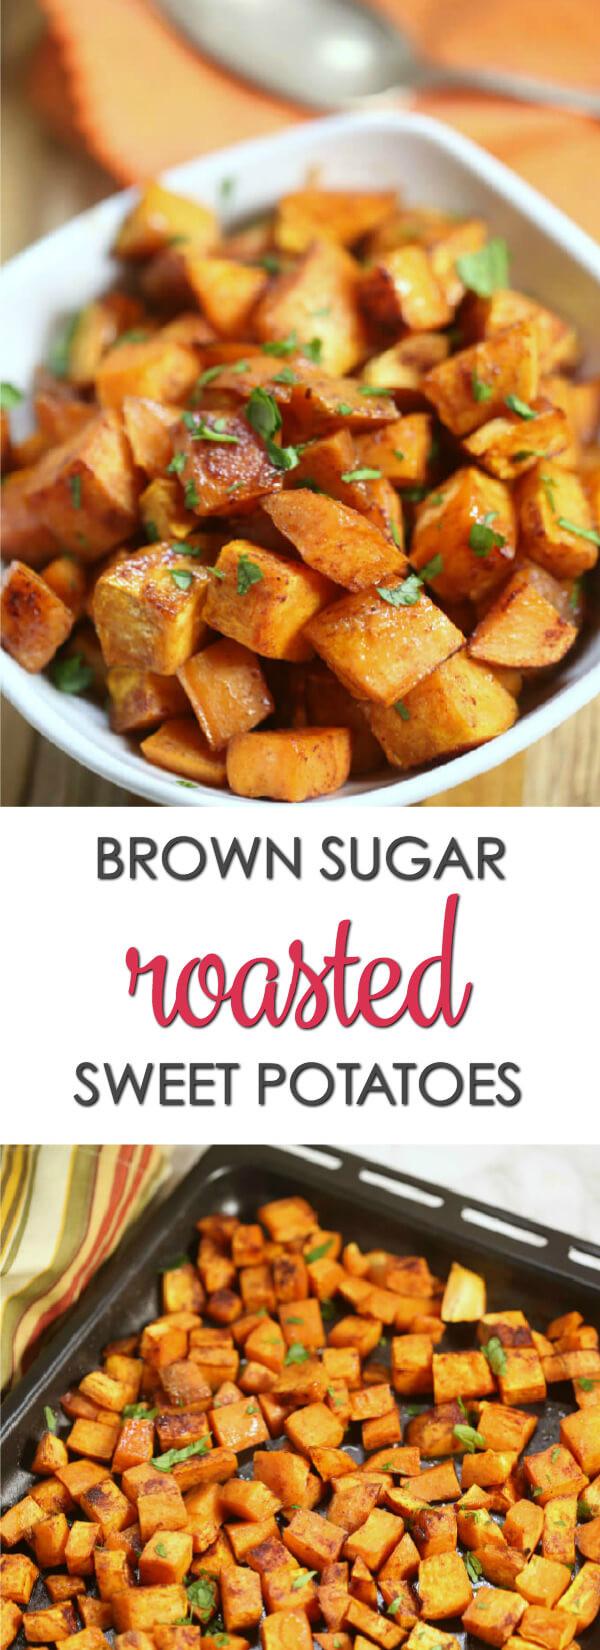 Roasted Sweet Potatoes Brown Sugar  Brown Sugar Roasted Sweet Potato Recipes It Is a Keeper